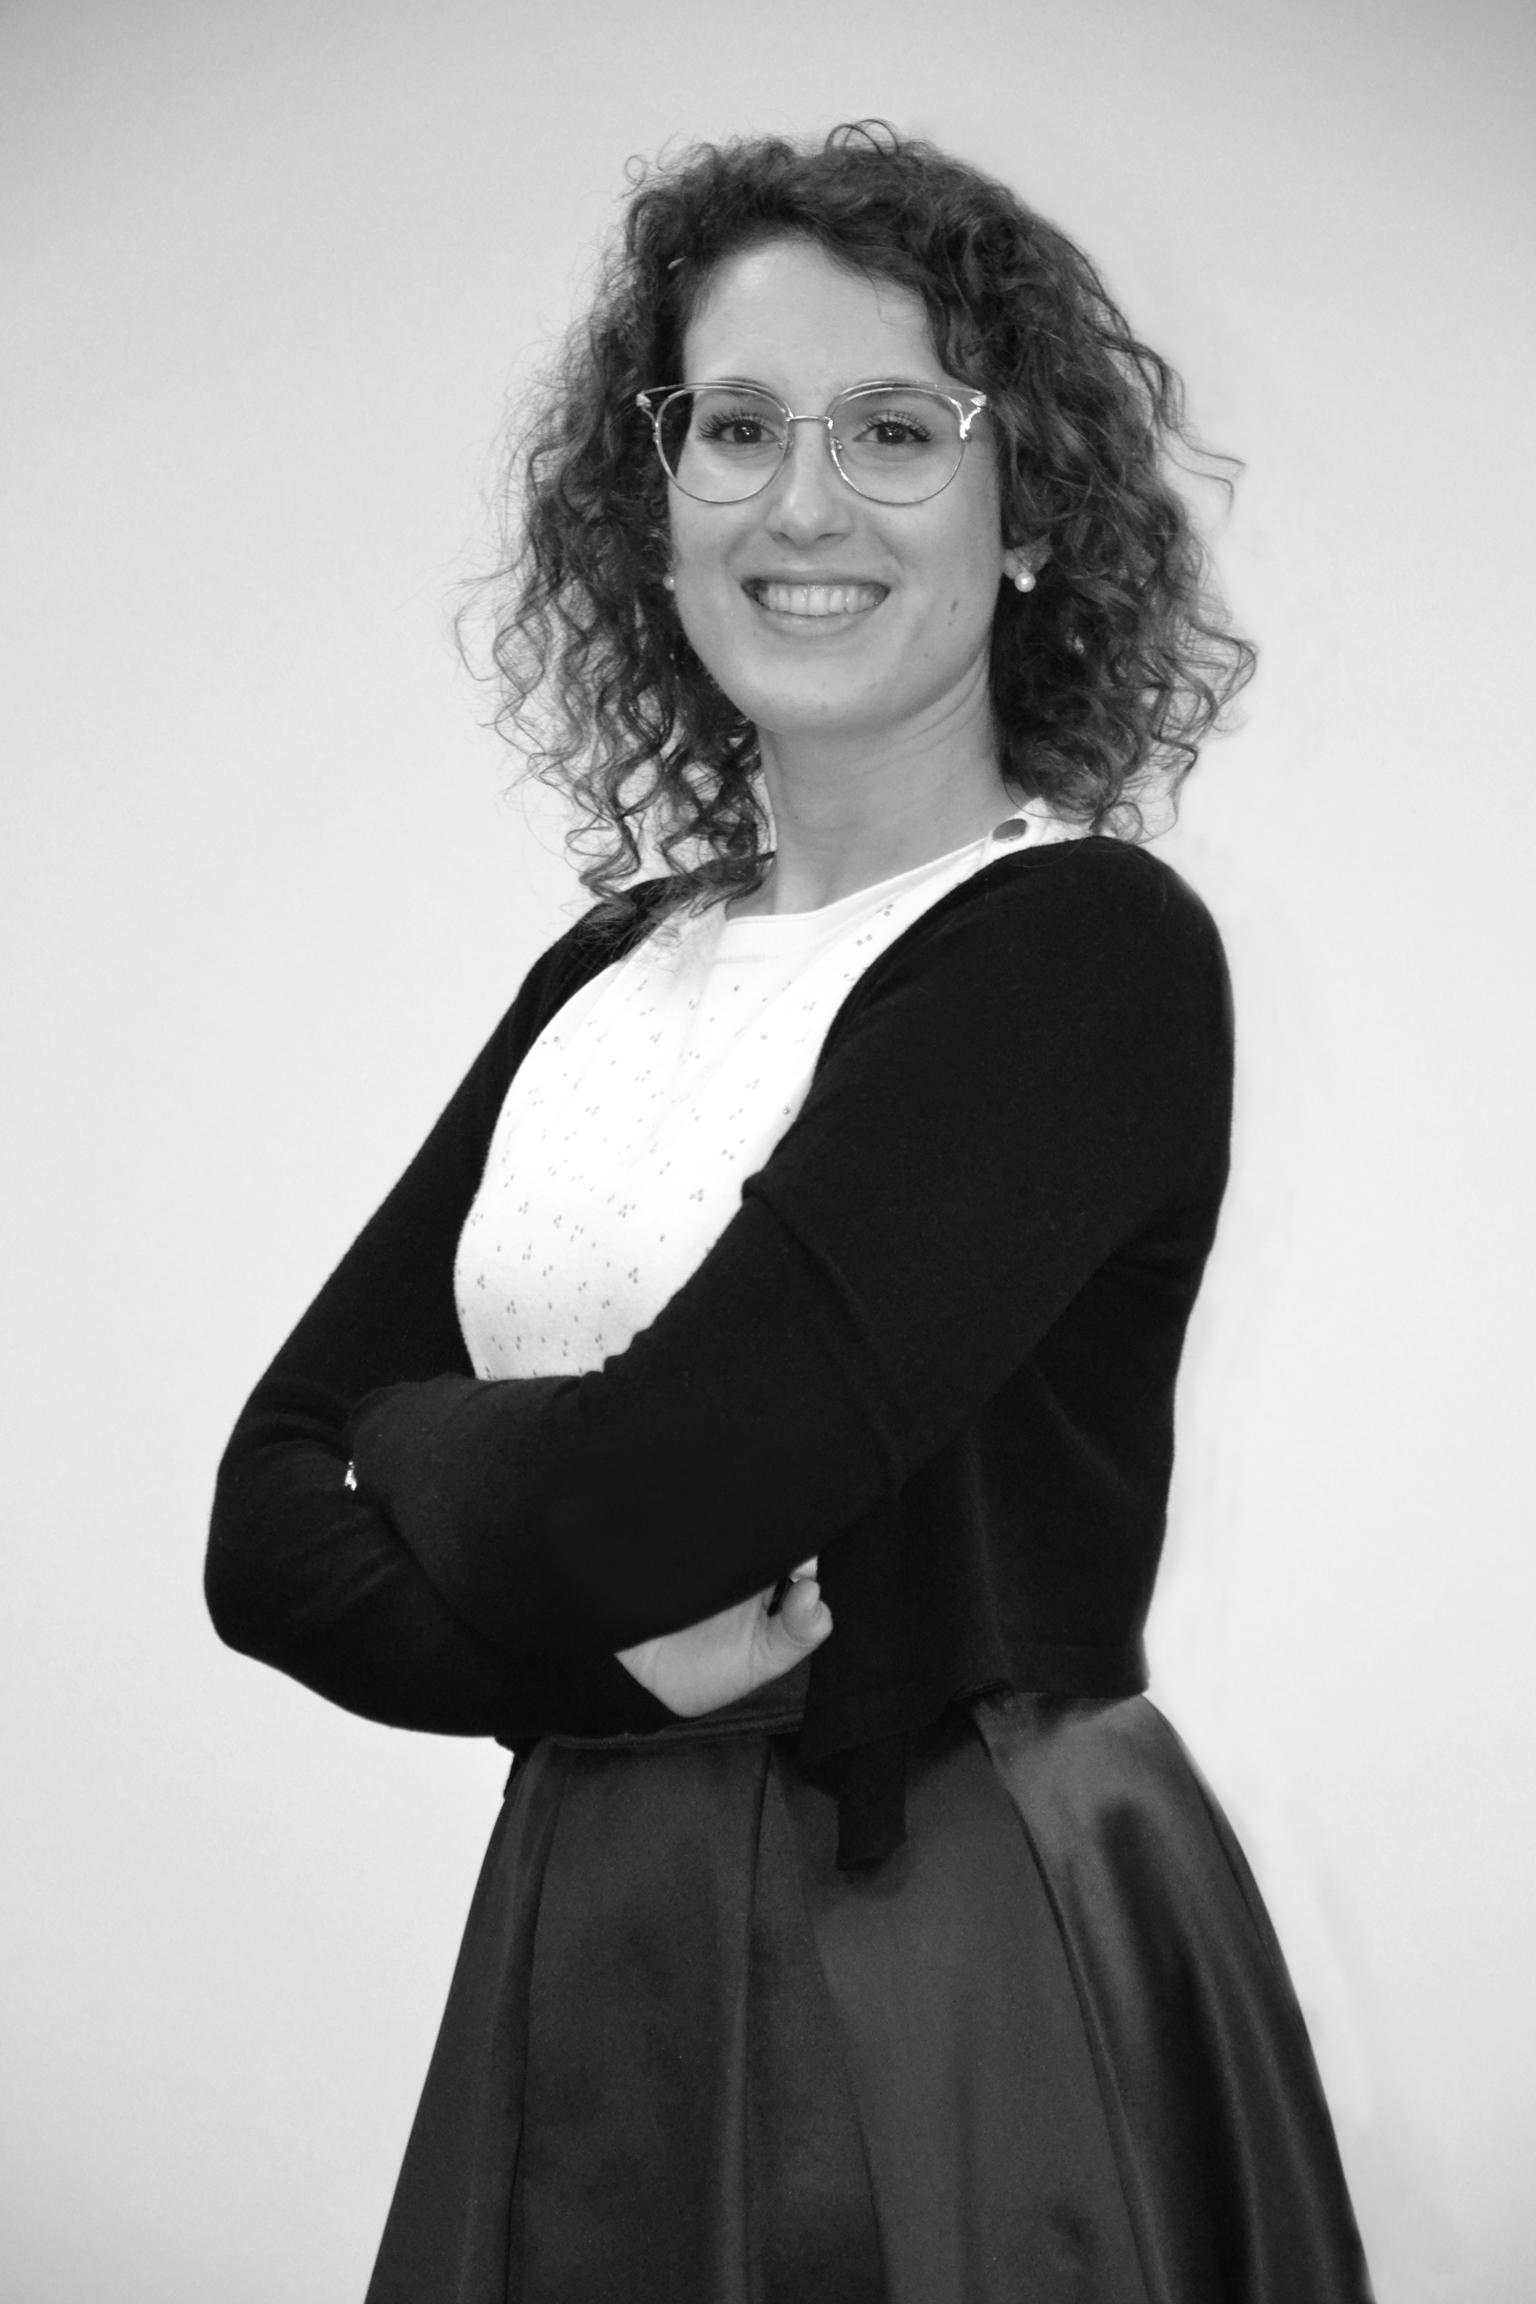 Ilaria Bianco